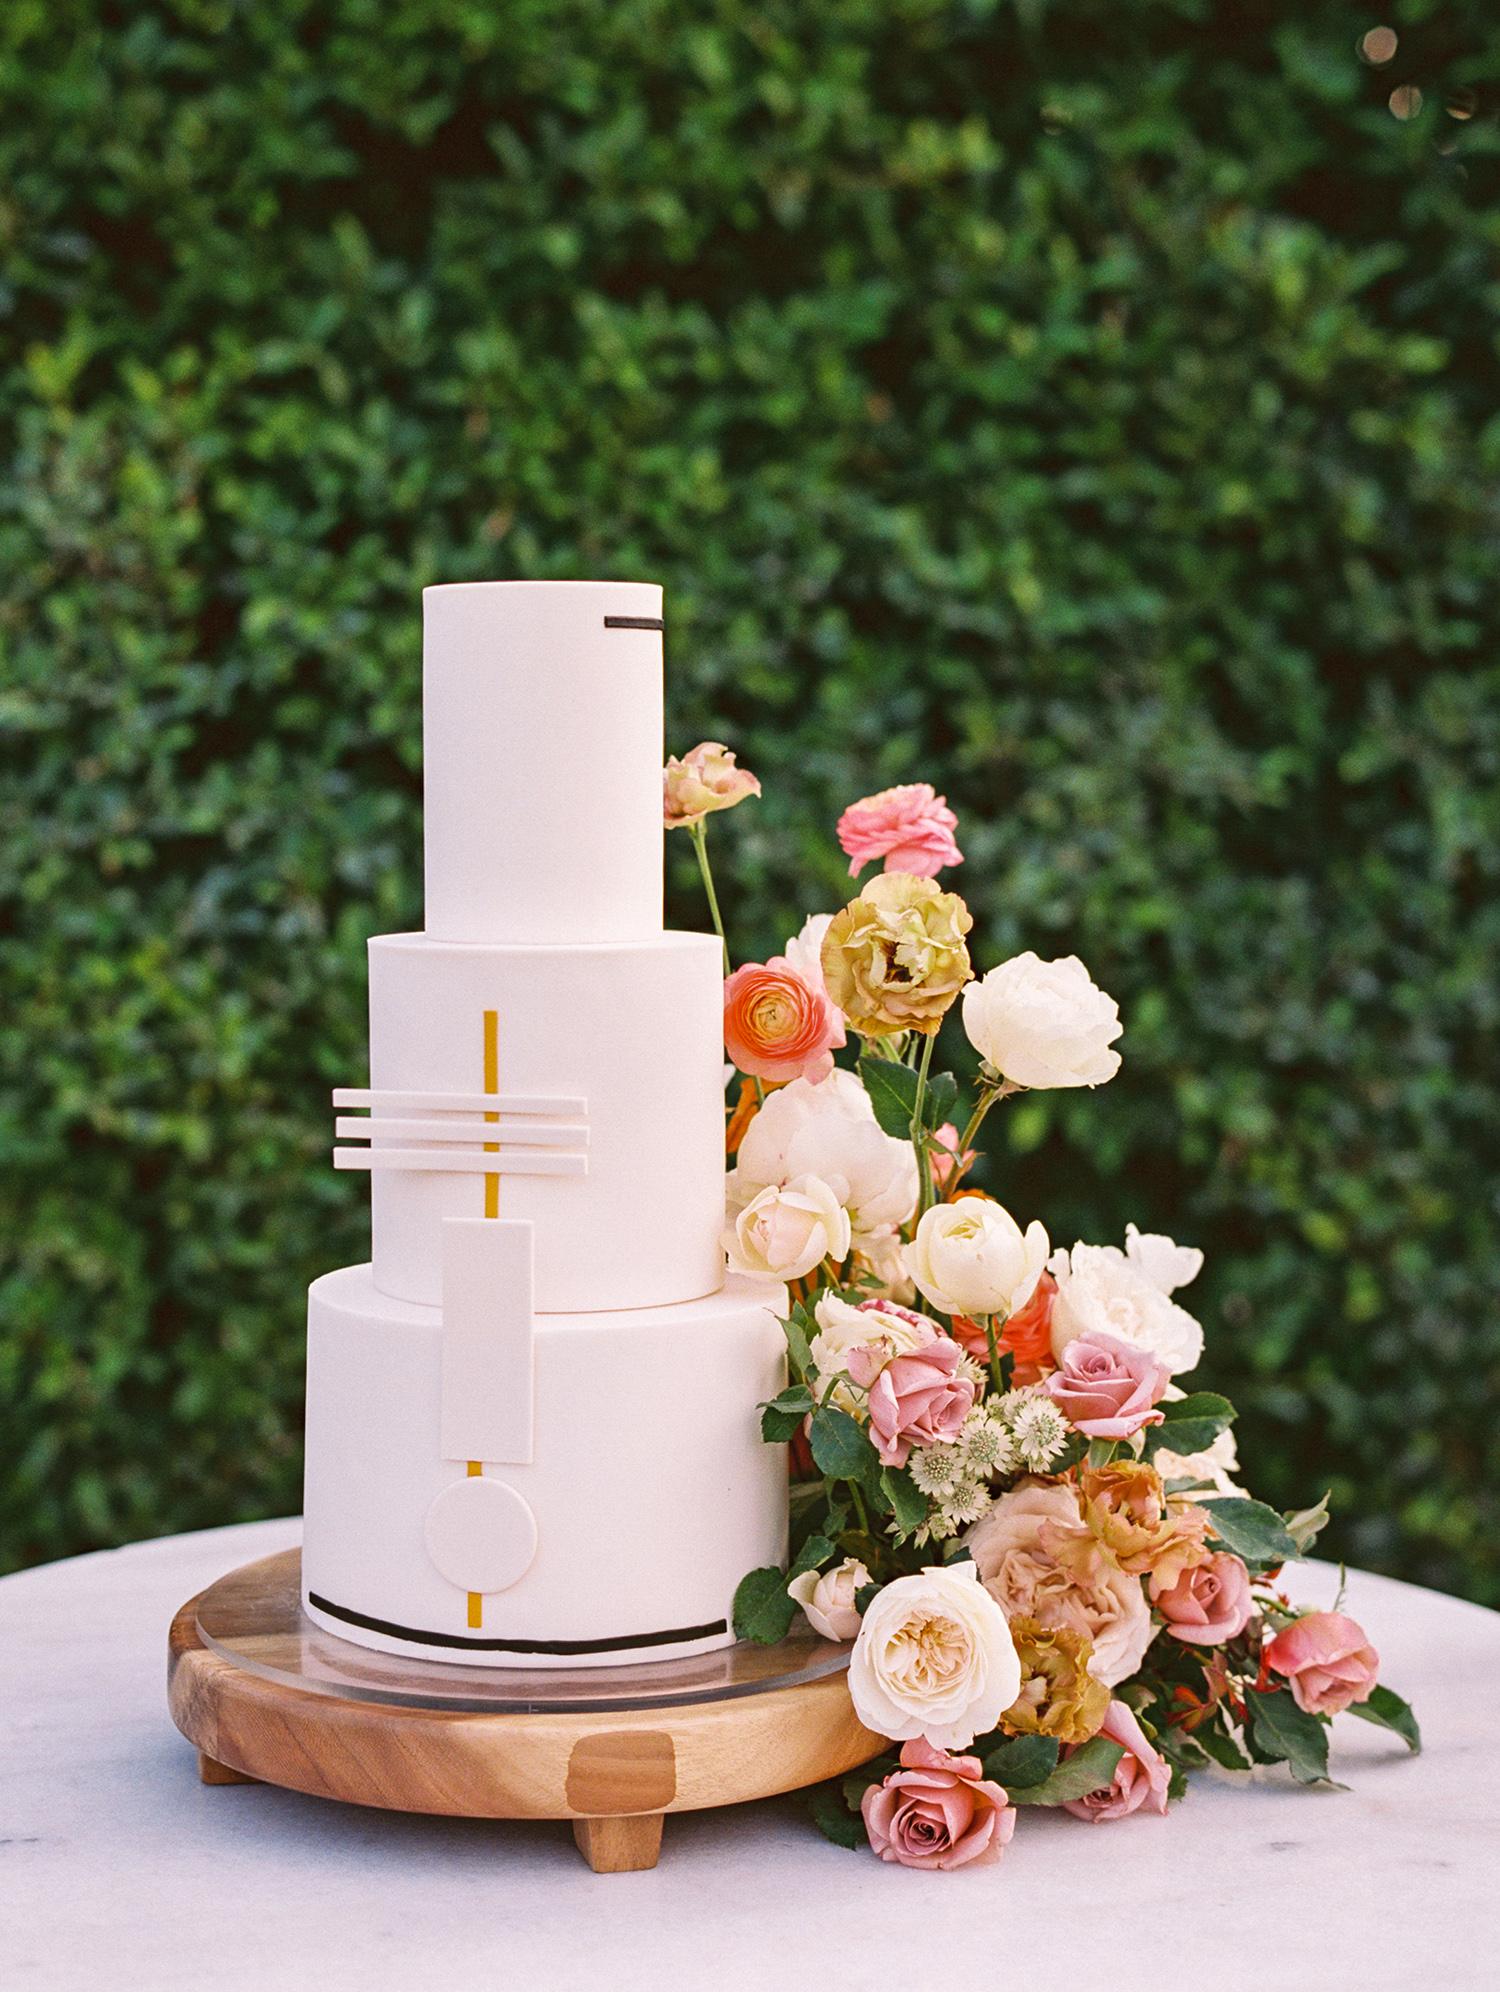 hanna will wedding cake